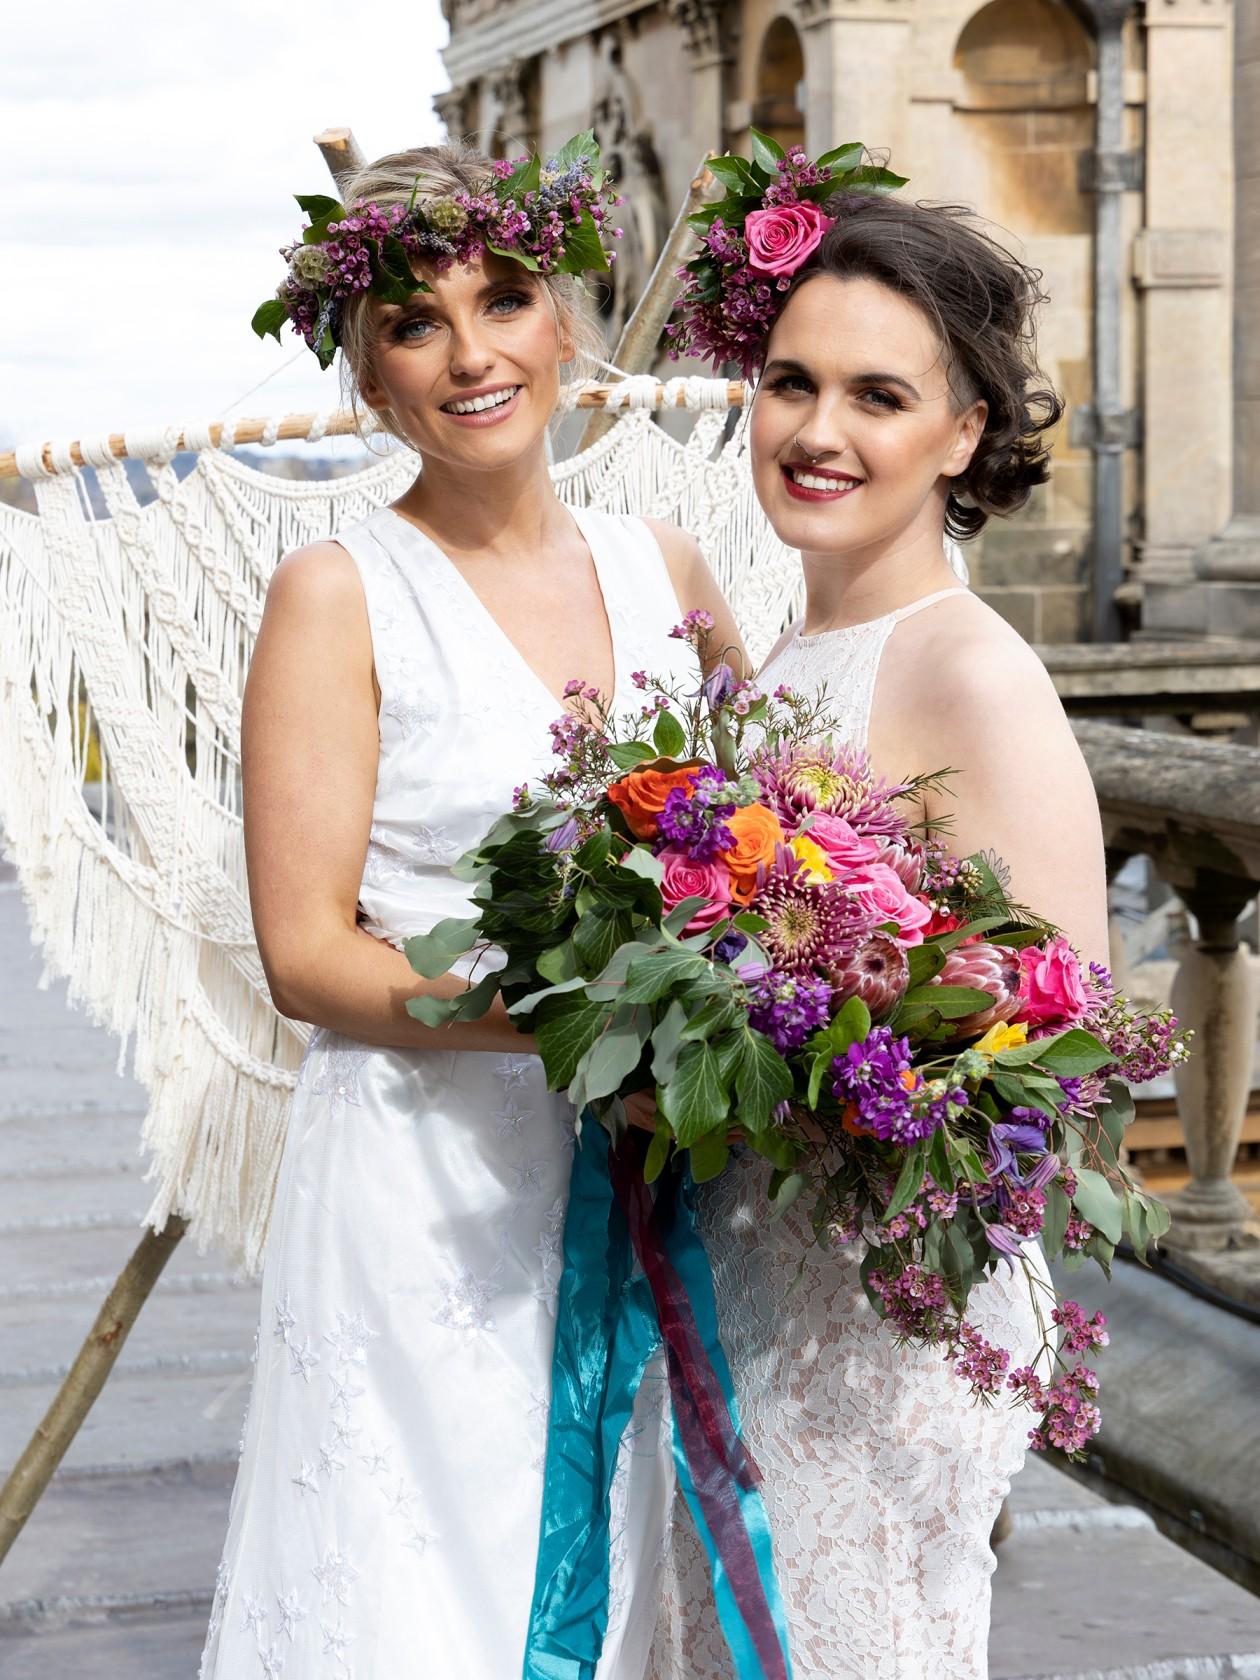 modern boho wedding, boho micro wedding, colourful wedding, macrame wedding backdrop, colourful wedding flowers, bridal headpieces